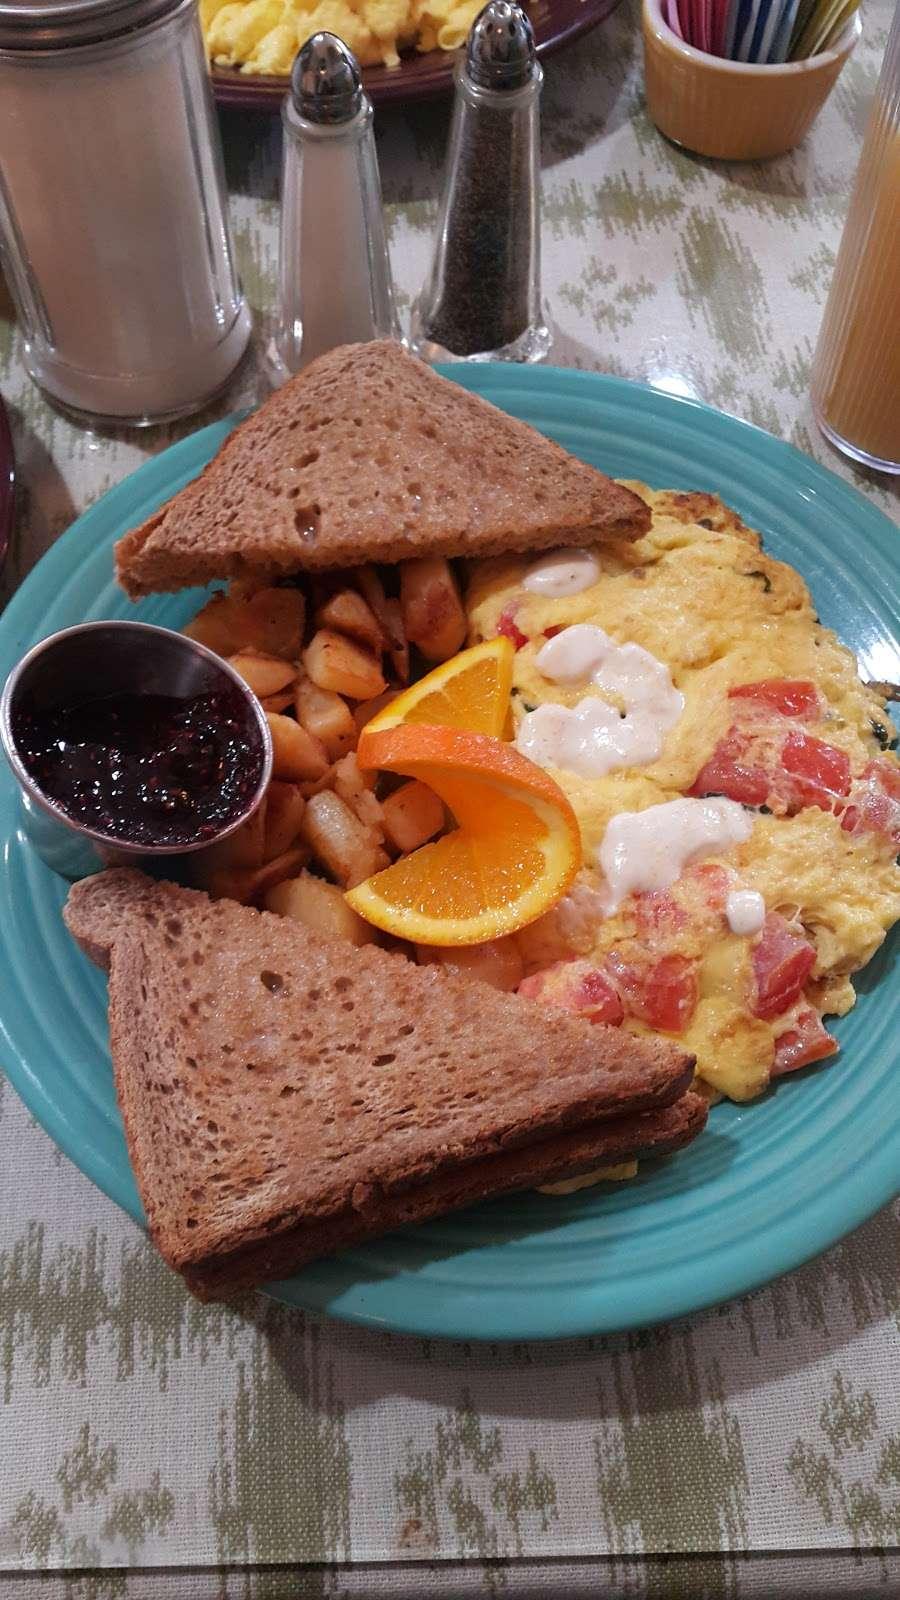 Breakfast Table - restaurant  | Photo 10 of 10 | Address: 1315 Tatamy Rd, Easton, PA 18045, USA | Phone: (610) 252-8783